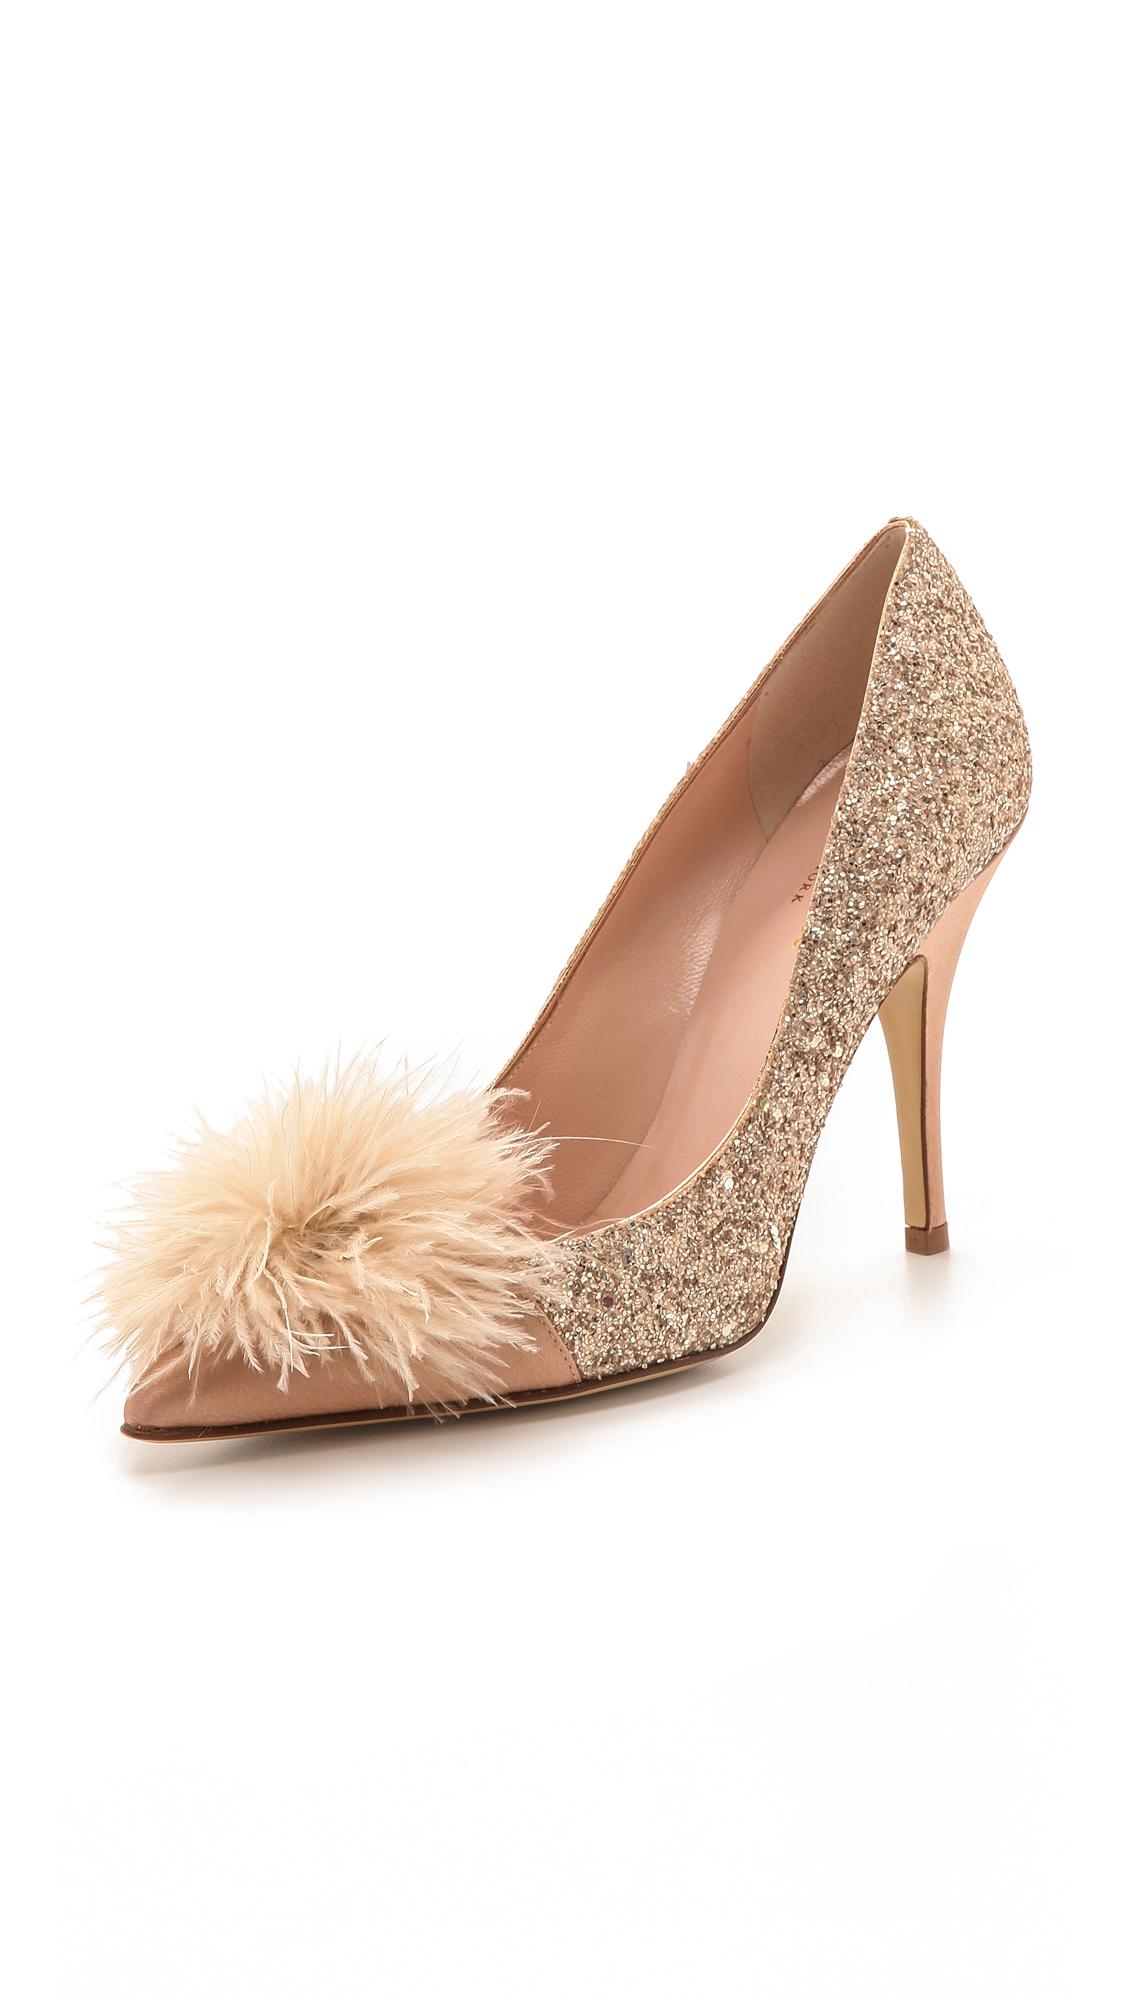 e0f9b214511 Kate Spade New York Lilo Marabou Glitter Pumps | SHOPBOP